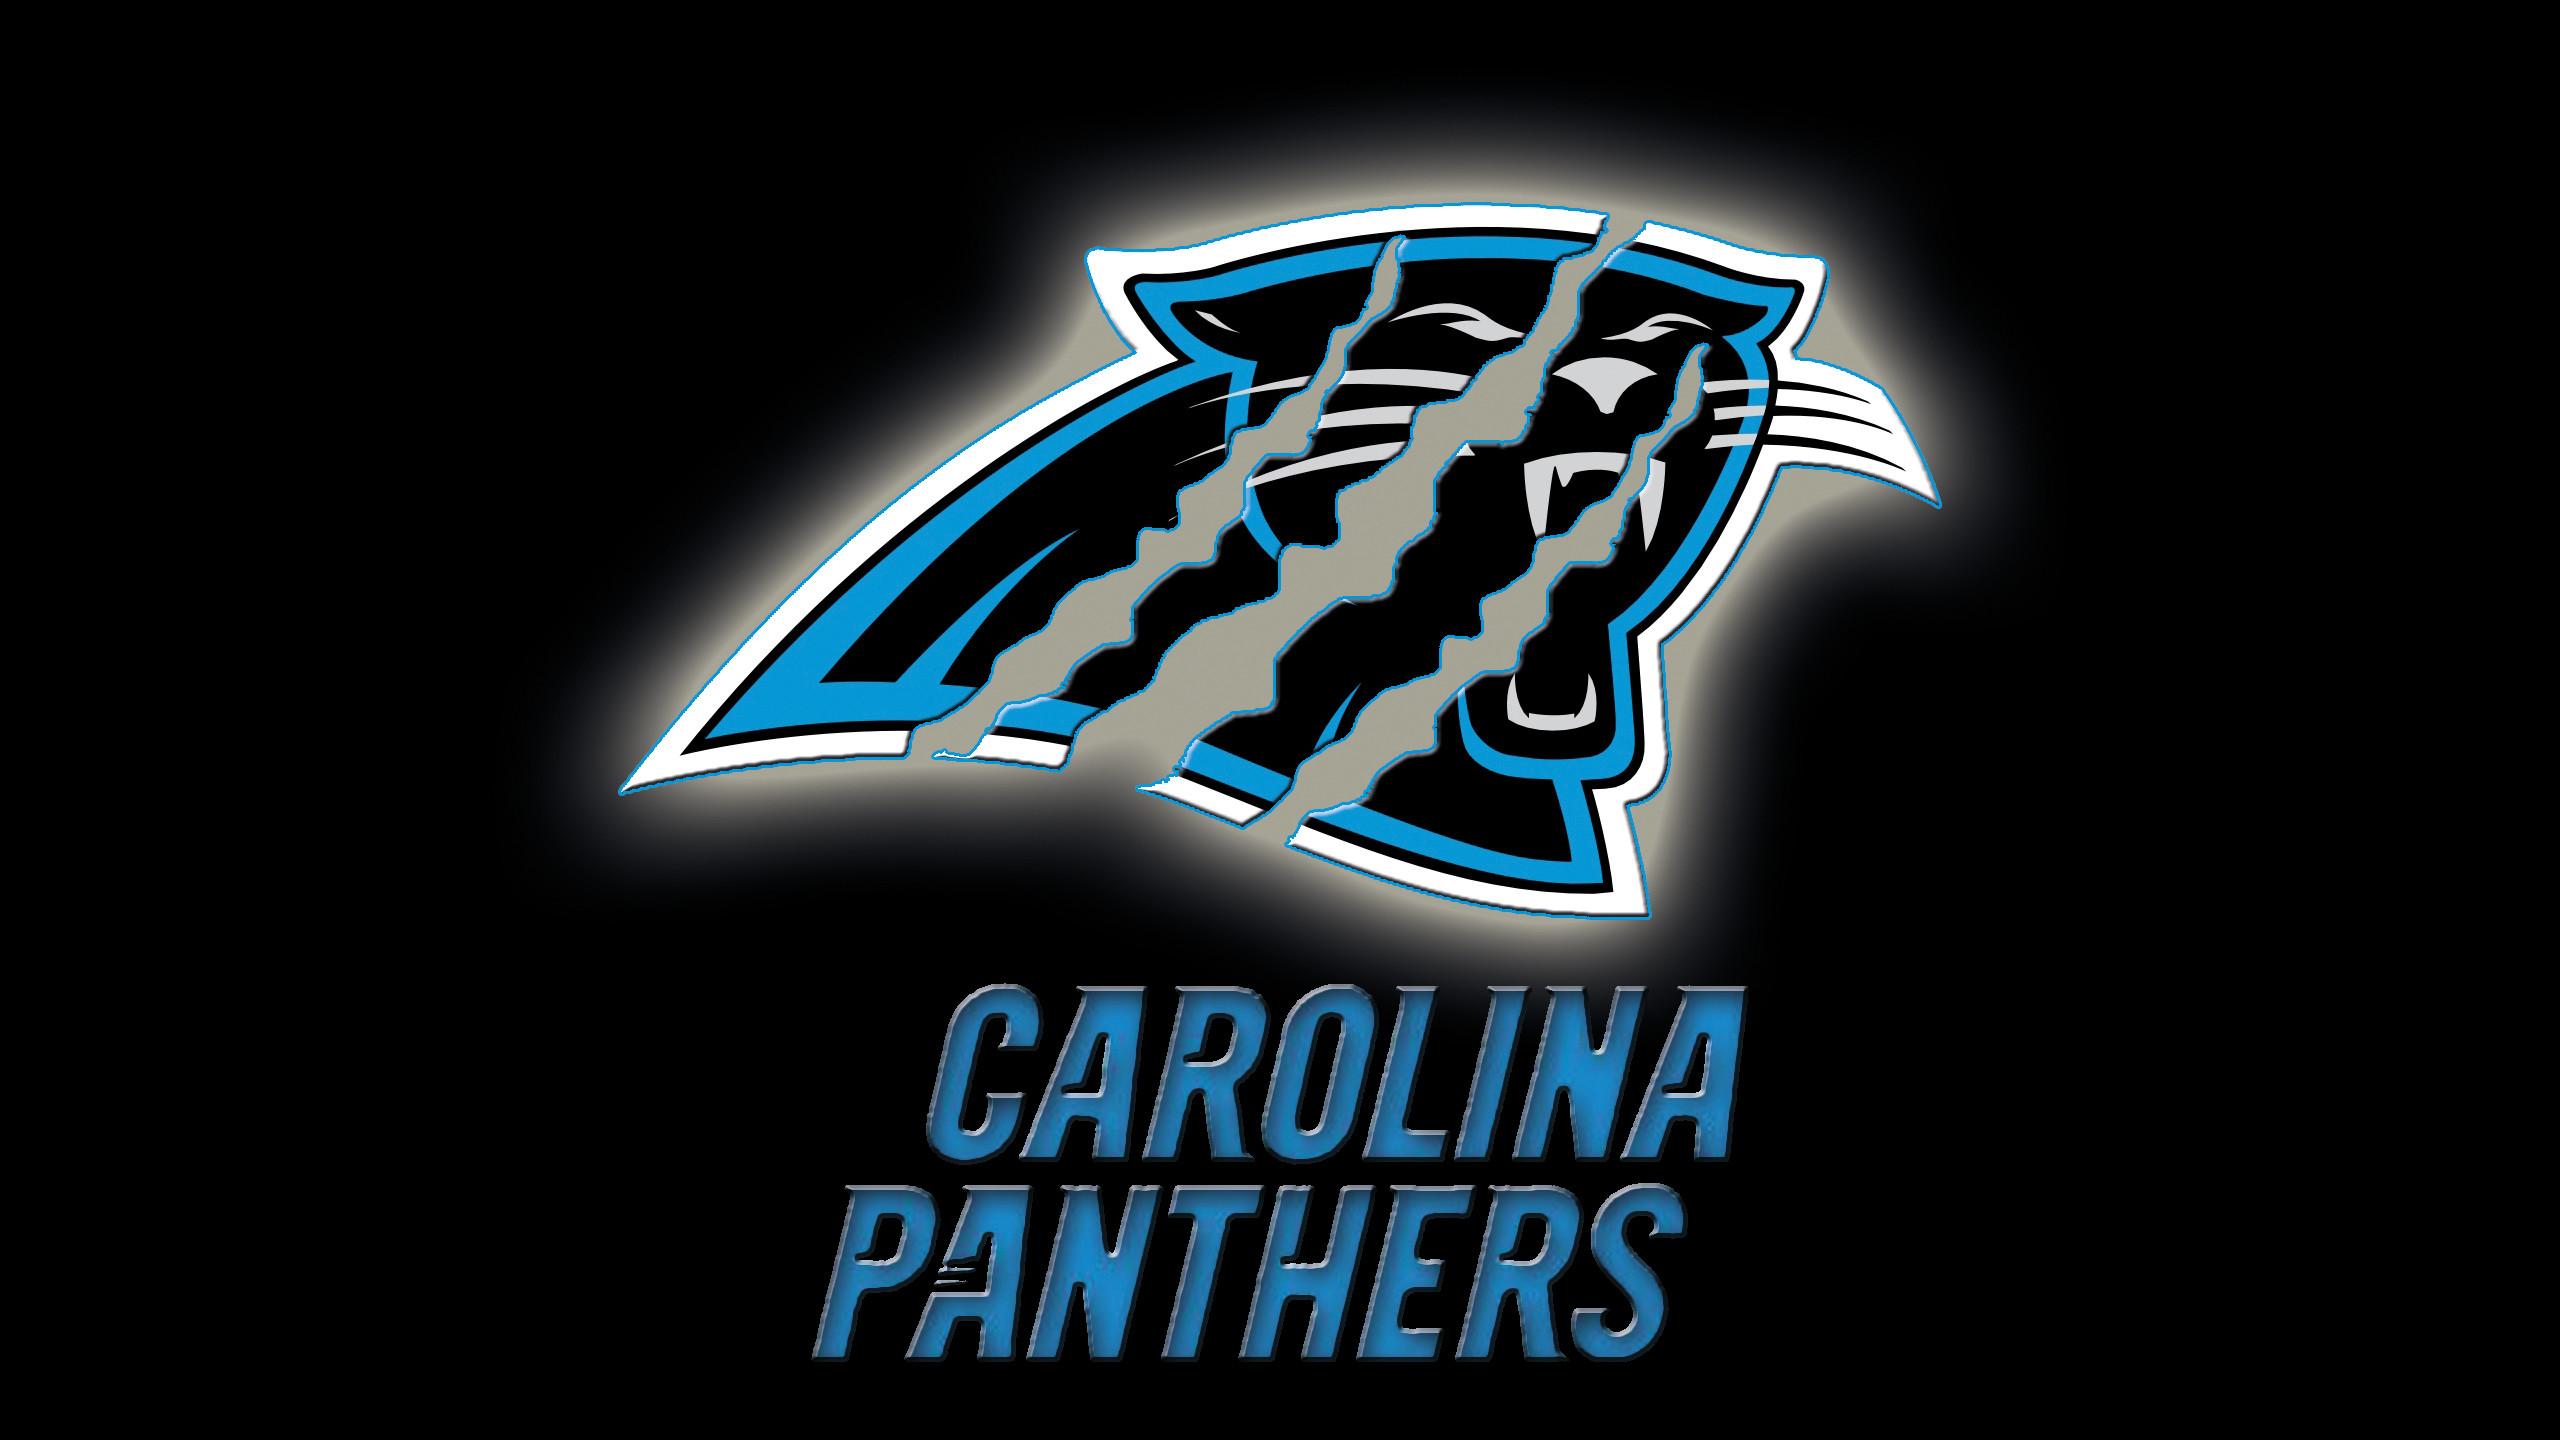 Carolina Panthers Wallpaper Hd 69 Images